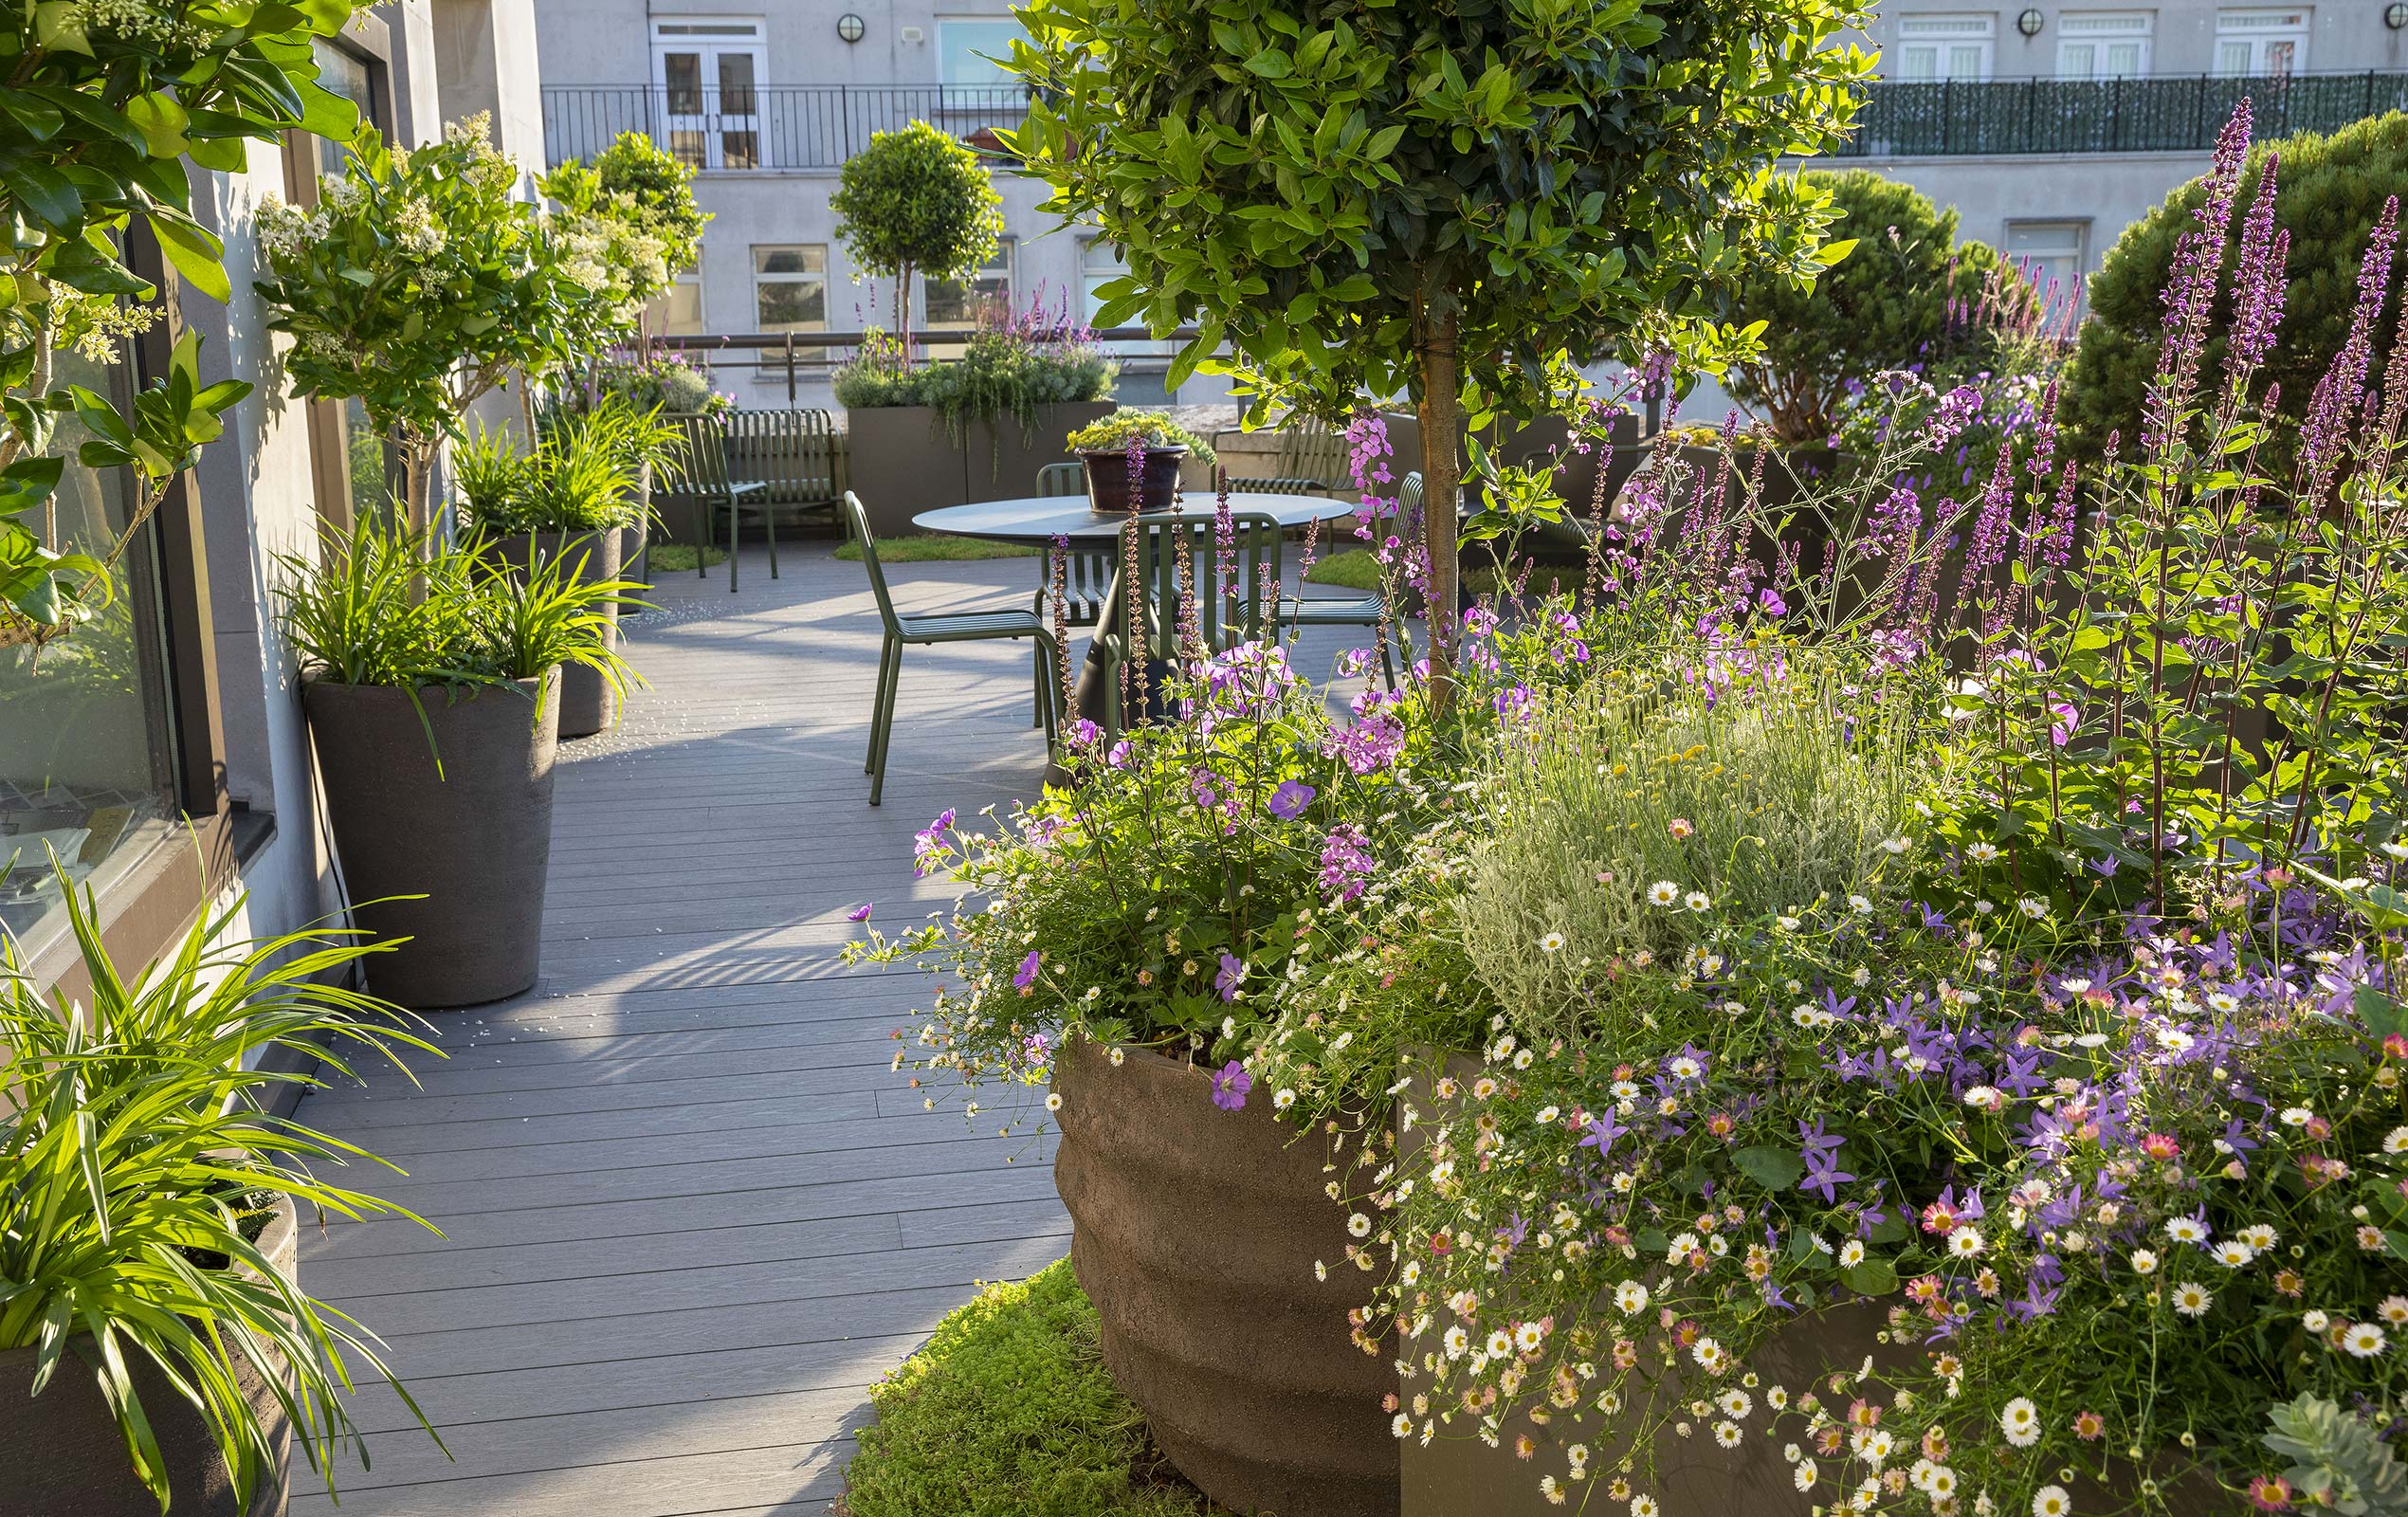 Mayfair Roof Terrace Design by Maïtanne Hunt